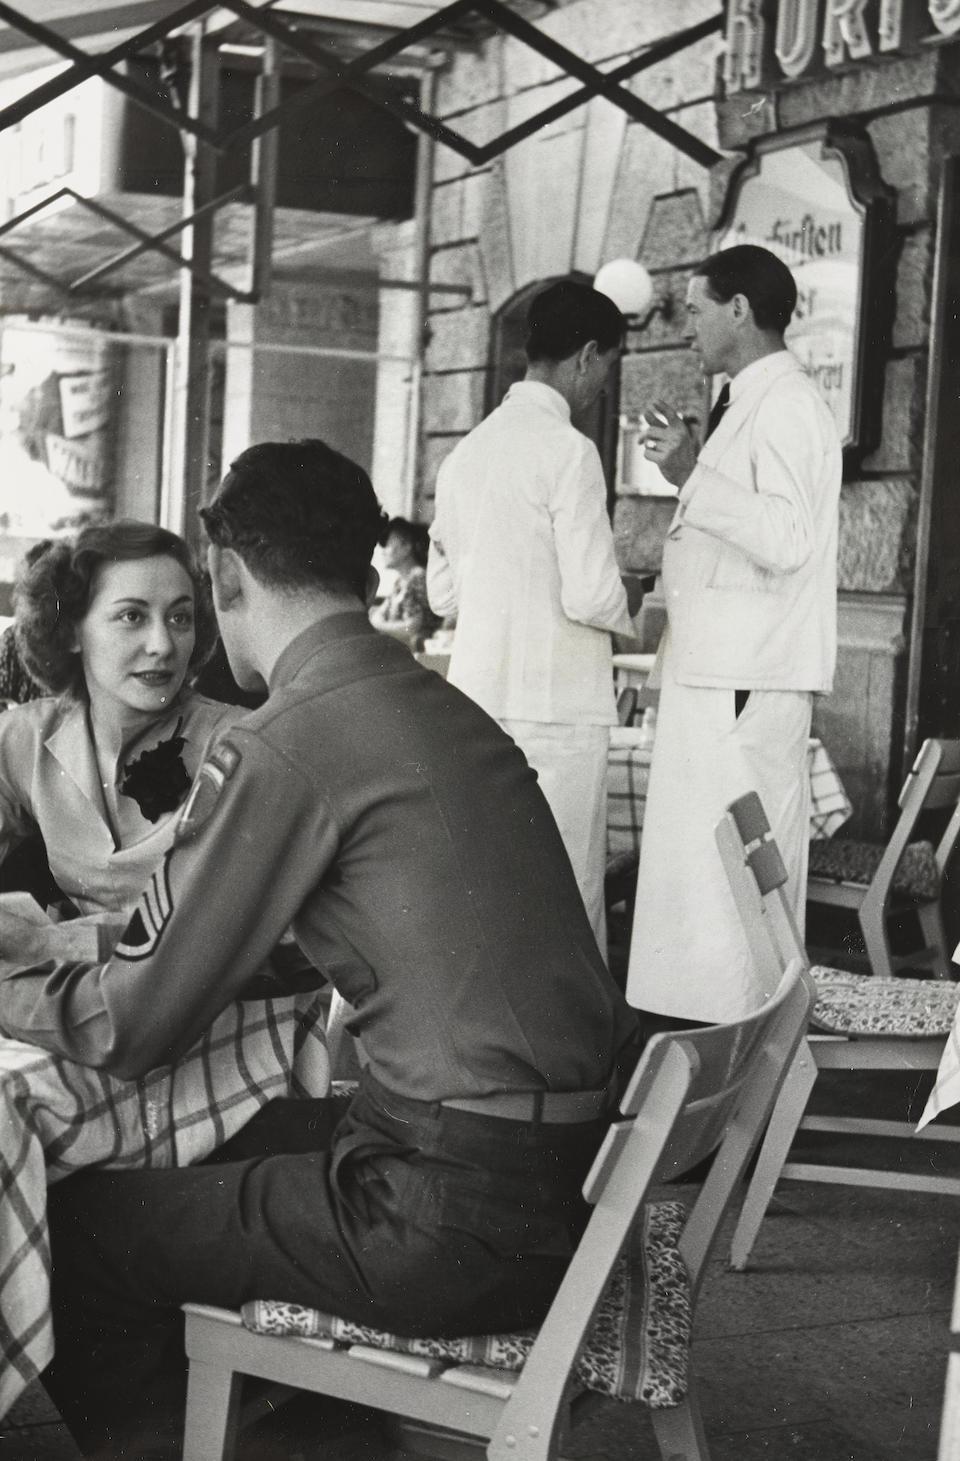 Henri Cartier-Bresson (1908-2004); London, Festival City; and Berlin, Europe's Strangest City; (2)